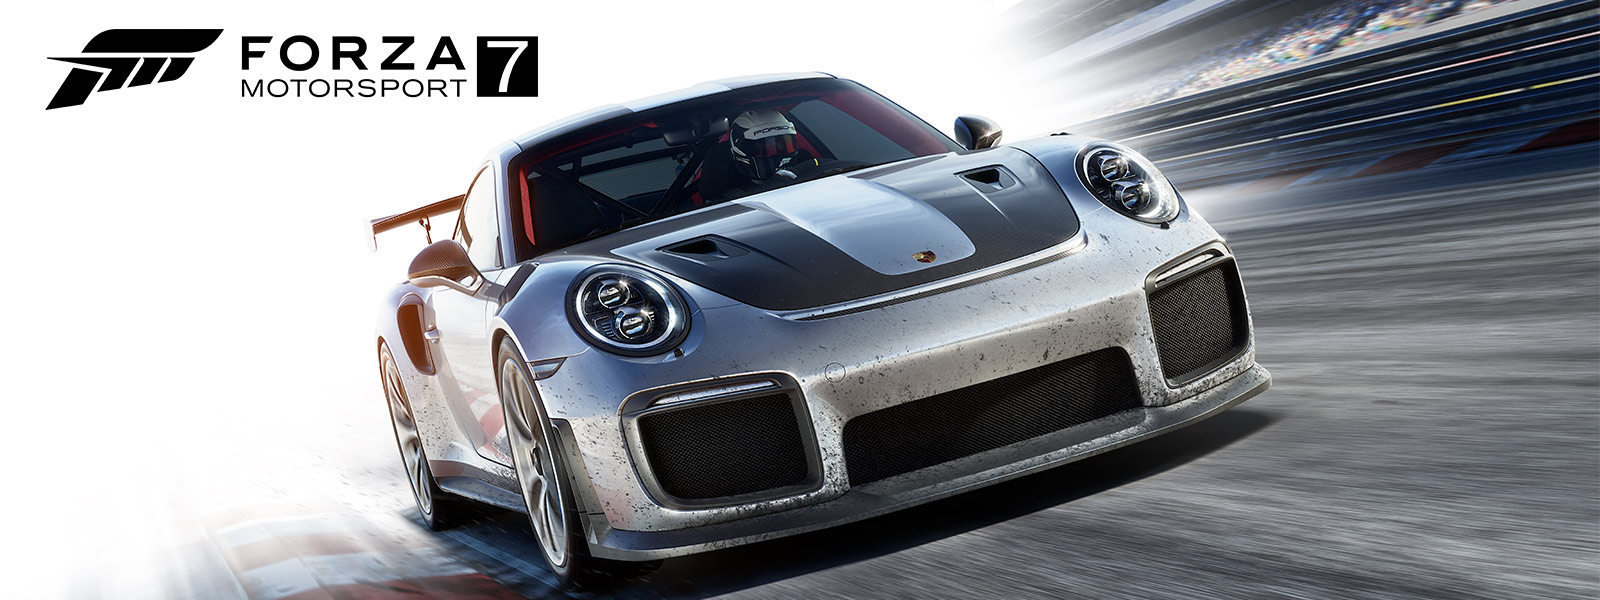 Forza Motorsport 7 game screen